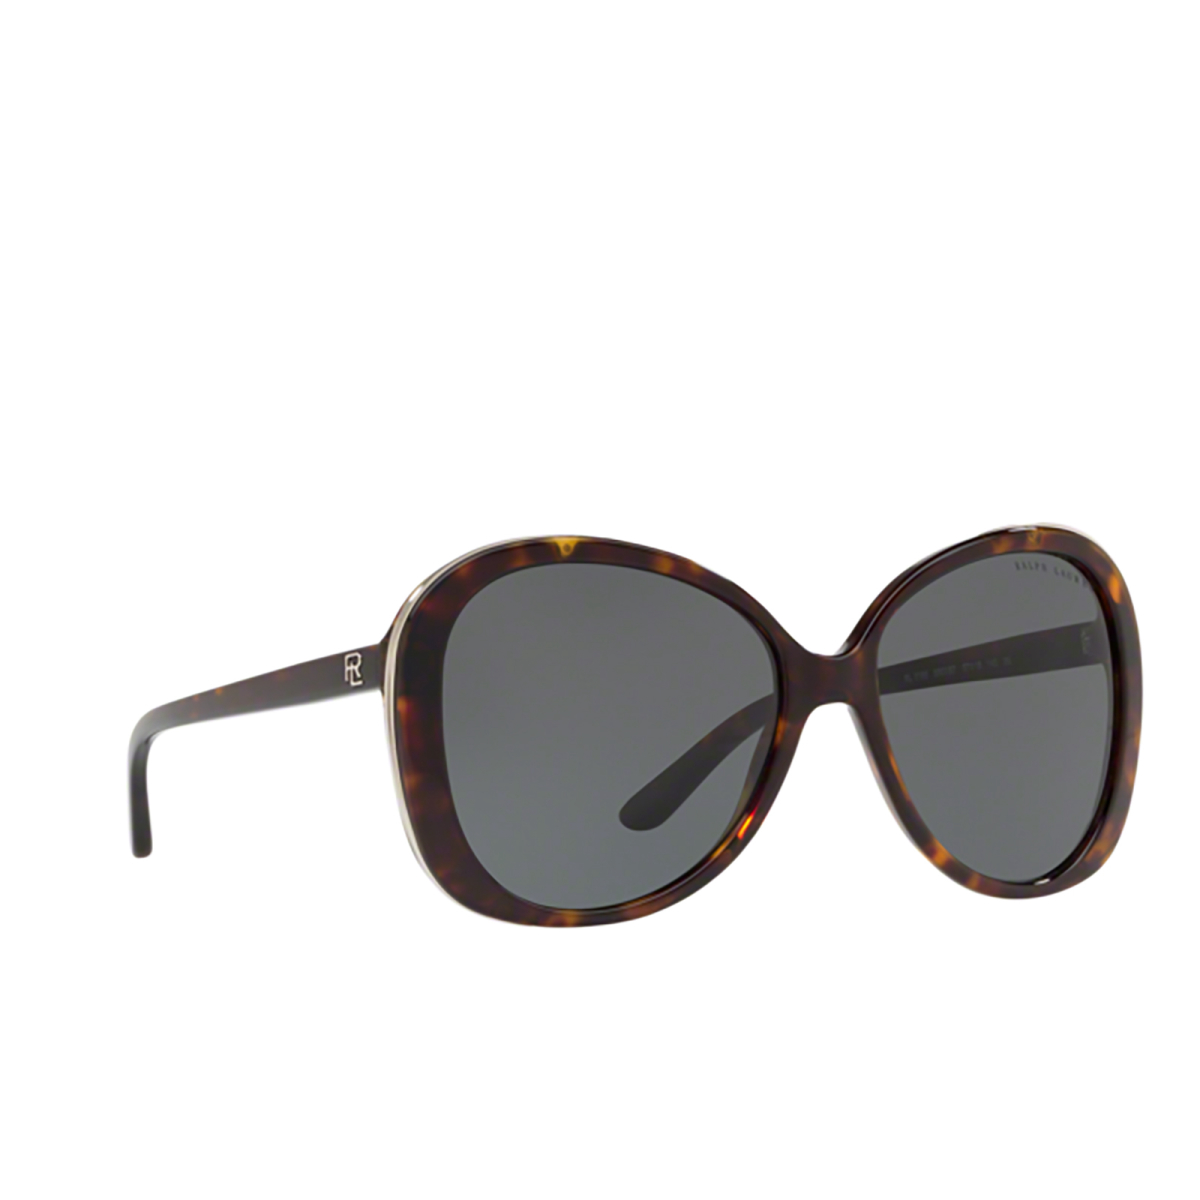 Ralph Lauren® Butterfly Sunglasses: RL8166 color Shiny Dark Havana 500387 - three-quarters view.